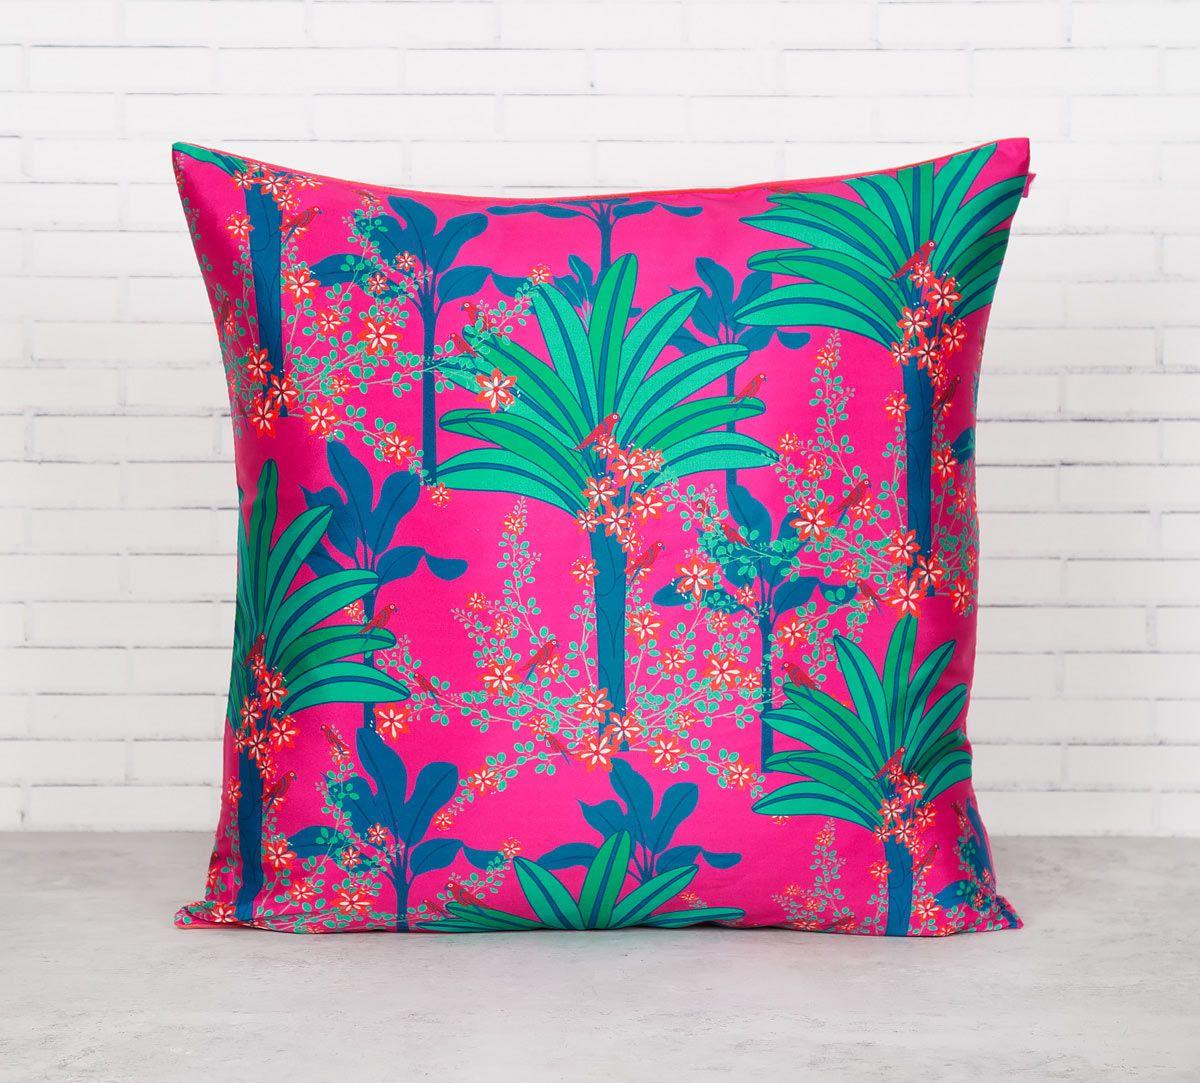 India Circus Royal Palms Blended Taf Silk Cushion Cover